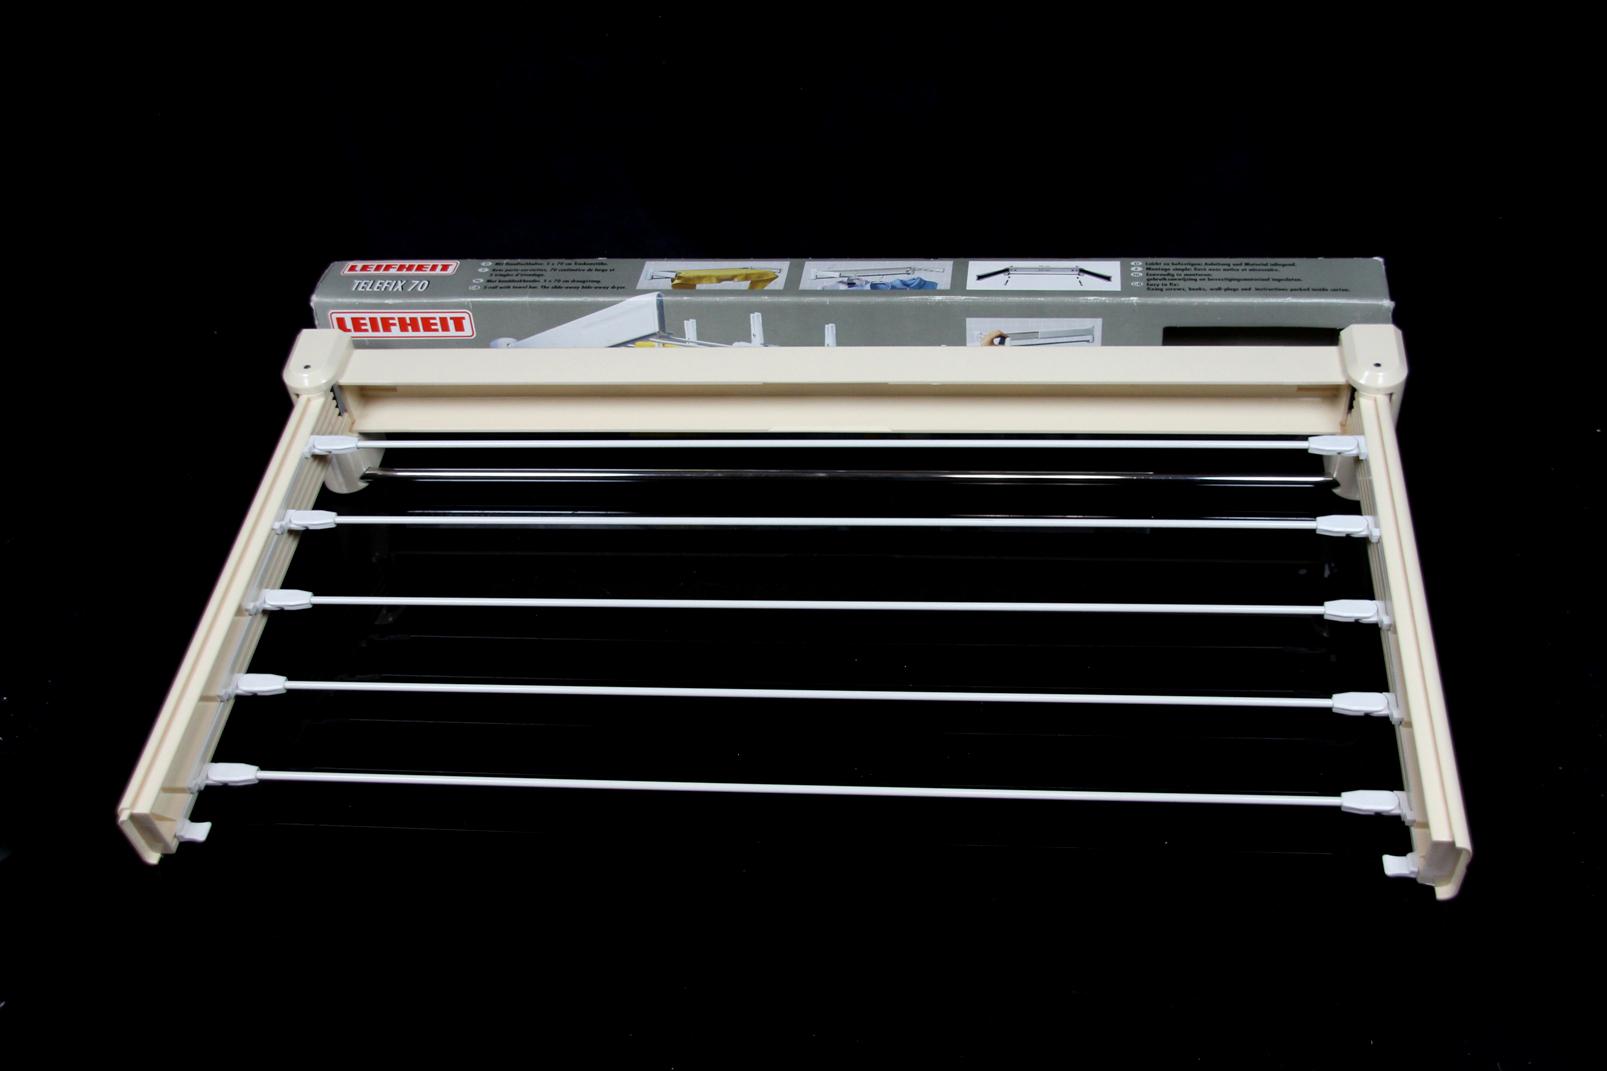 leifheit telegant telefix 70 wandtrockner wand w schetrockner 70x37x10 5 cm ovp. Black Bedroom Furniture Sets. Home Design Ideas